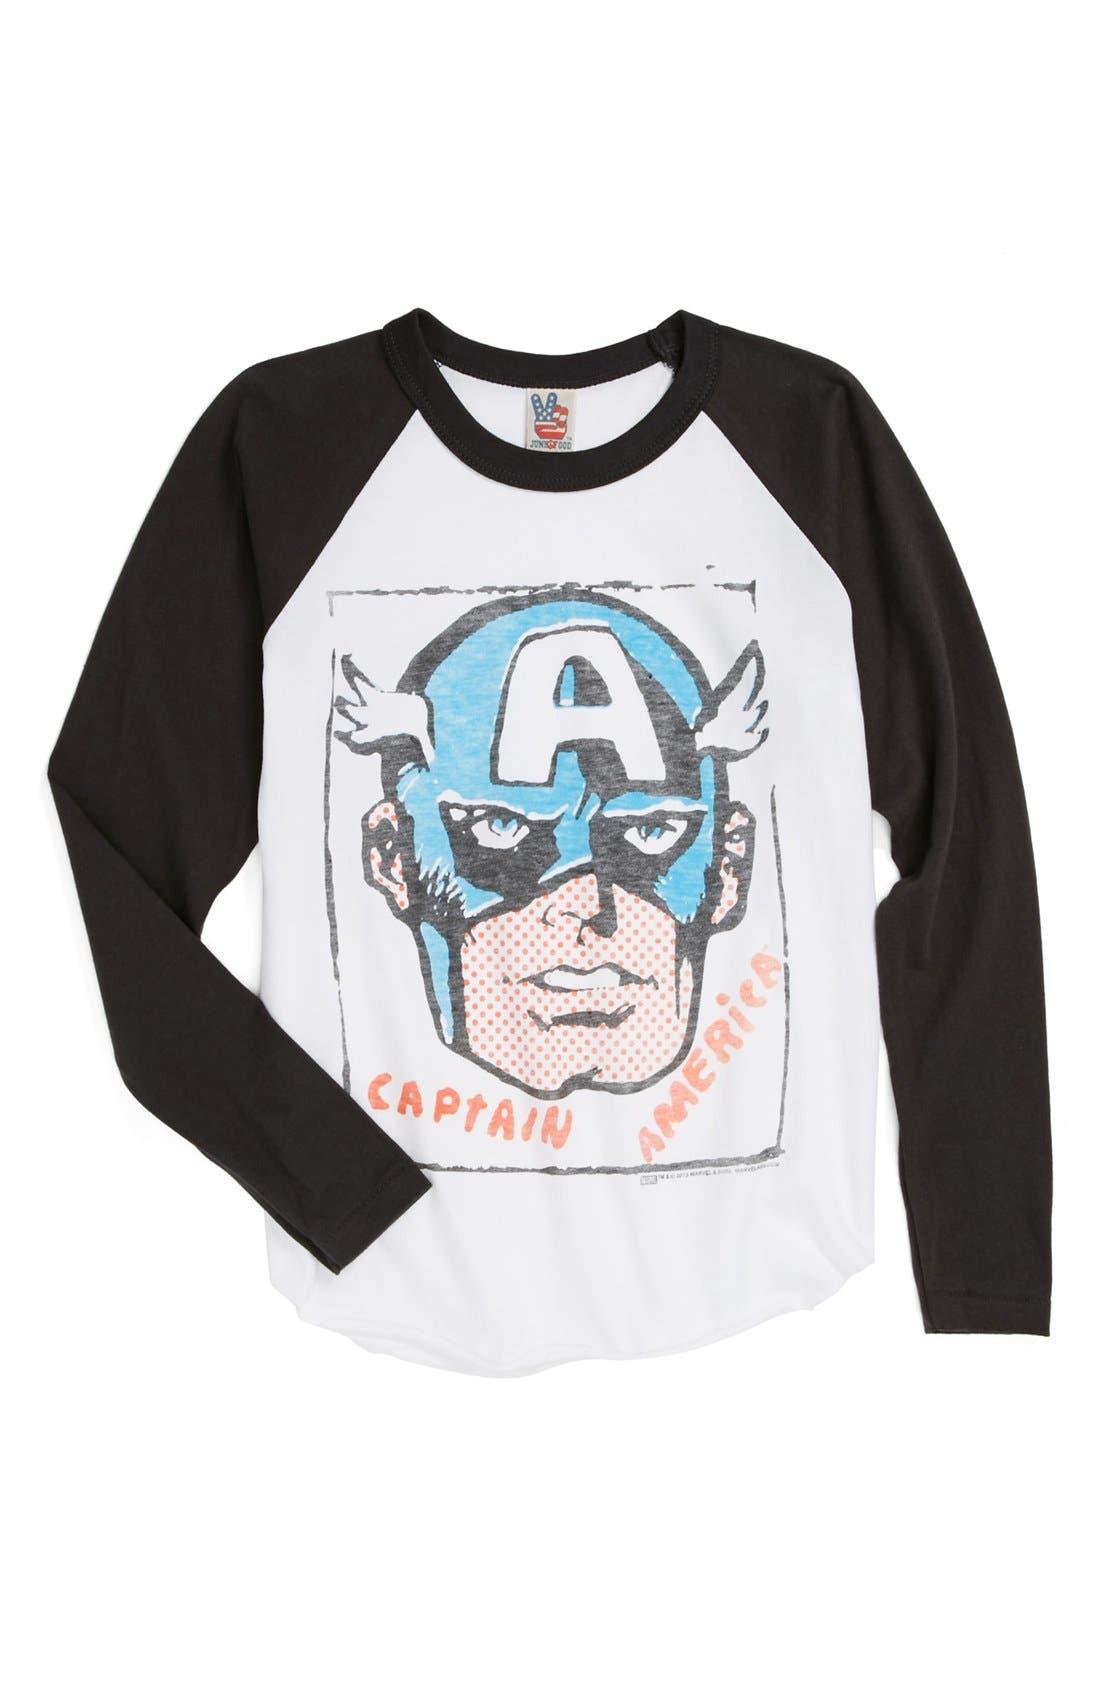 Alternate Image 1 Selected - Junk Food 'Captain America™' Baseball T-Shirt (Toddler Boys, Little Boys & Big Boys)